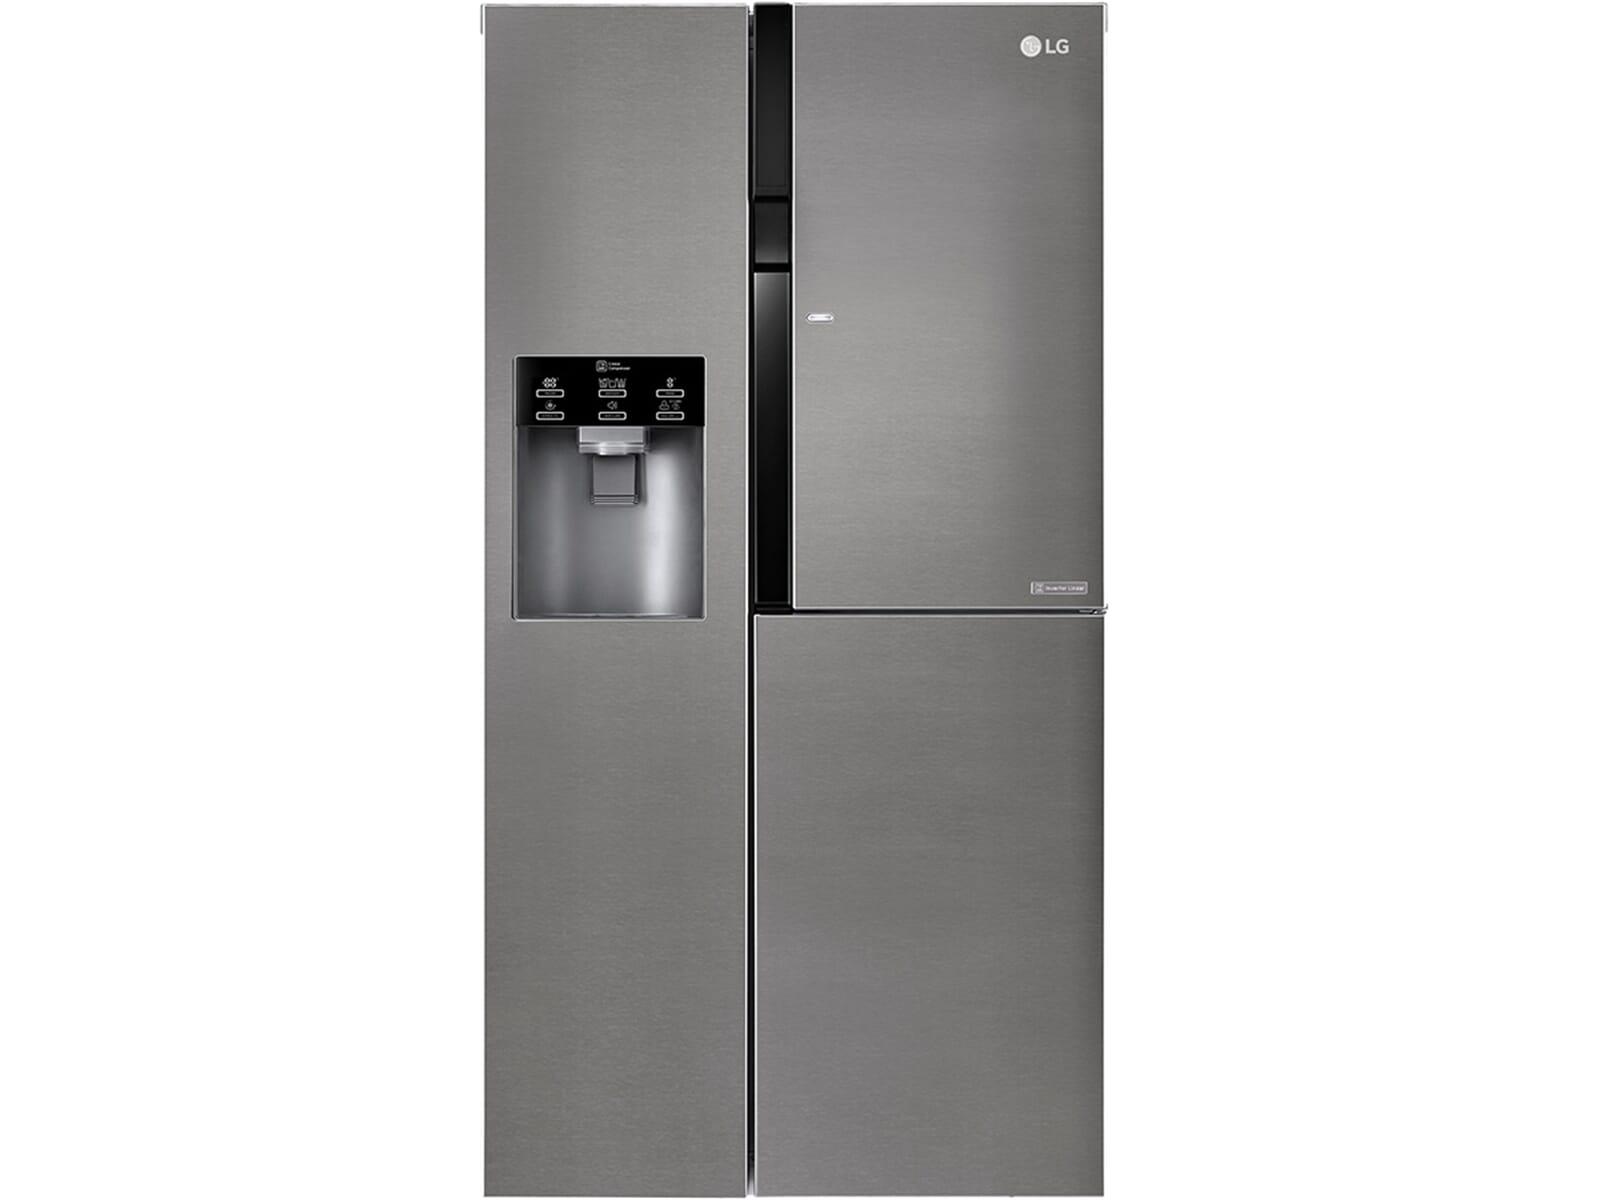 Smeg Kühlschrank Knacken : Gorenje kühlschrank verliert wasser der kühlschrank knackt